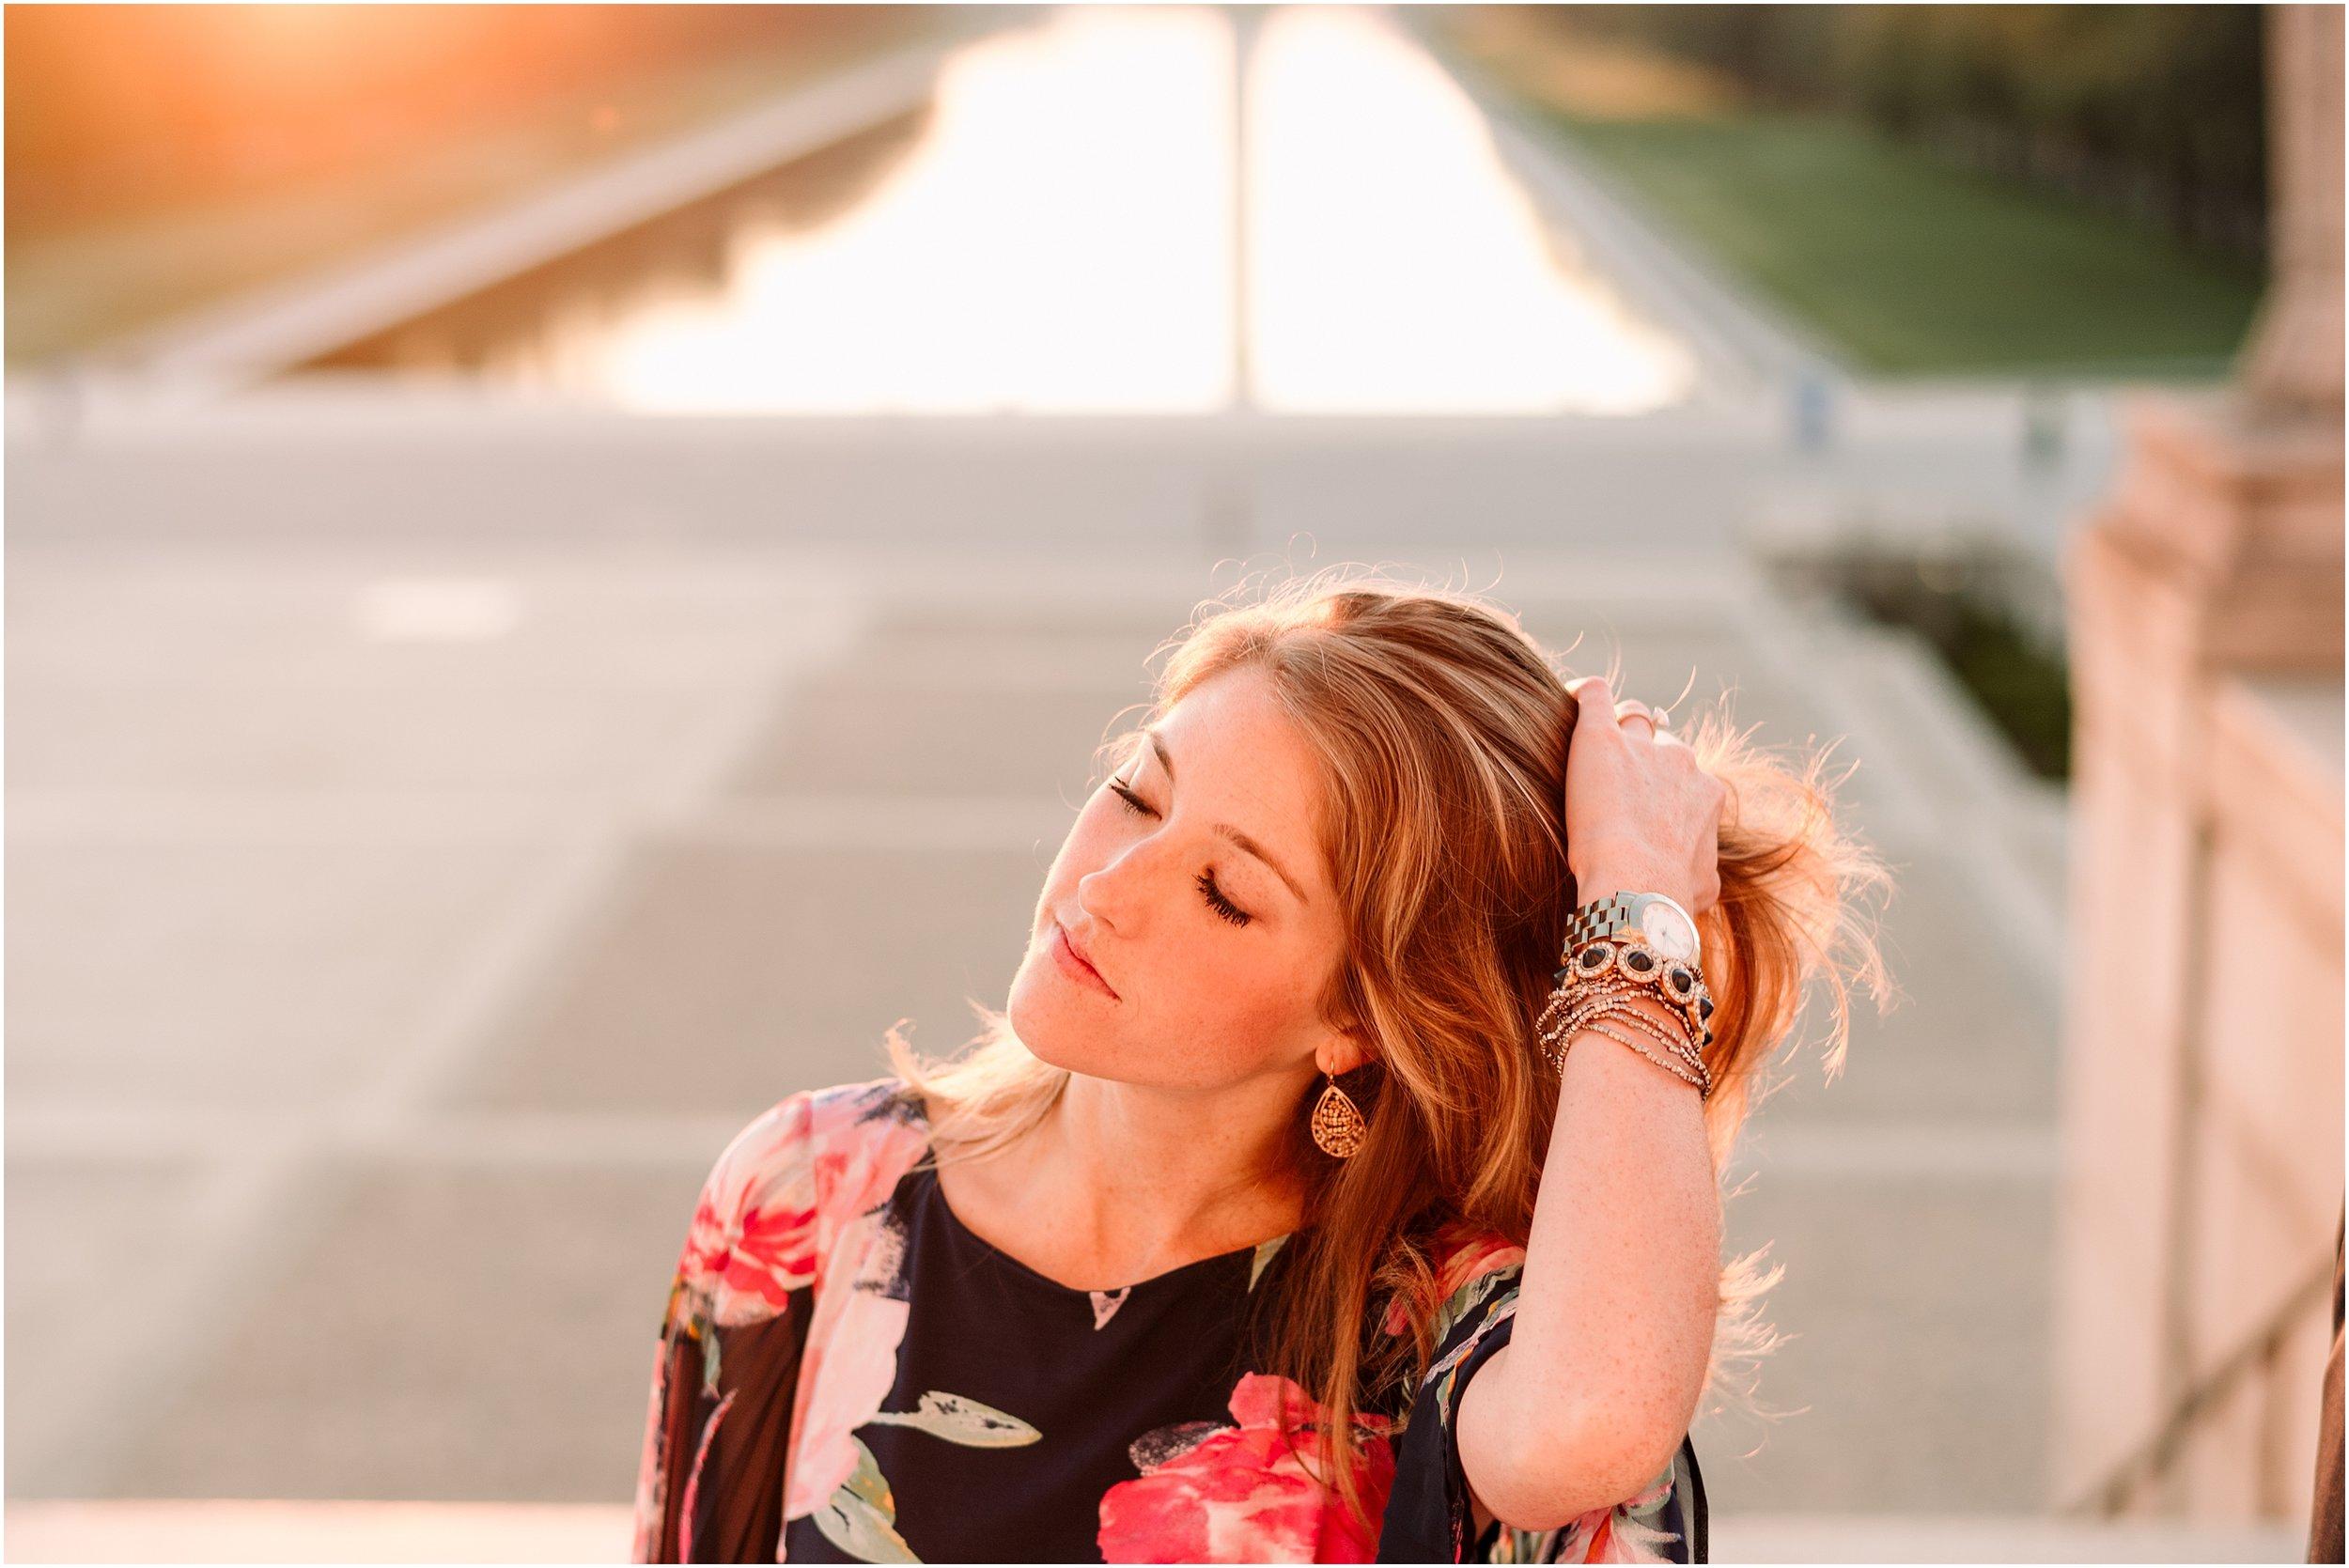 hannah leigh photography Sunrise Jefferson Memorial Engagement Session, Washington DC_1039.jpg